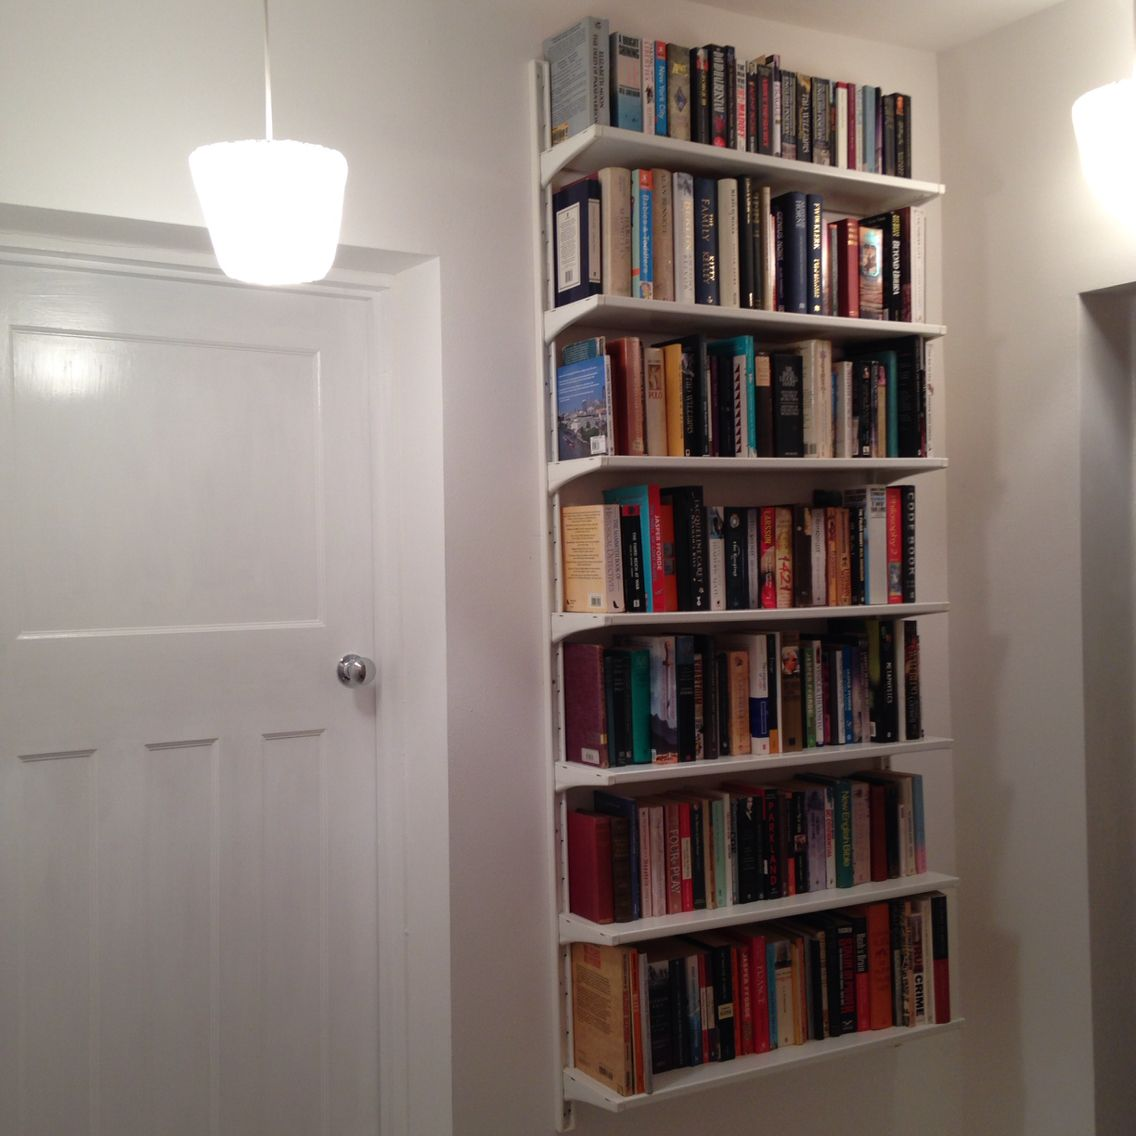 Ikea algot floating bookcases keeps floor space clear for - Estanteria algot ikea ...